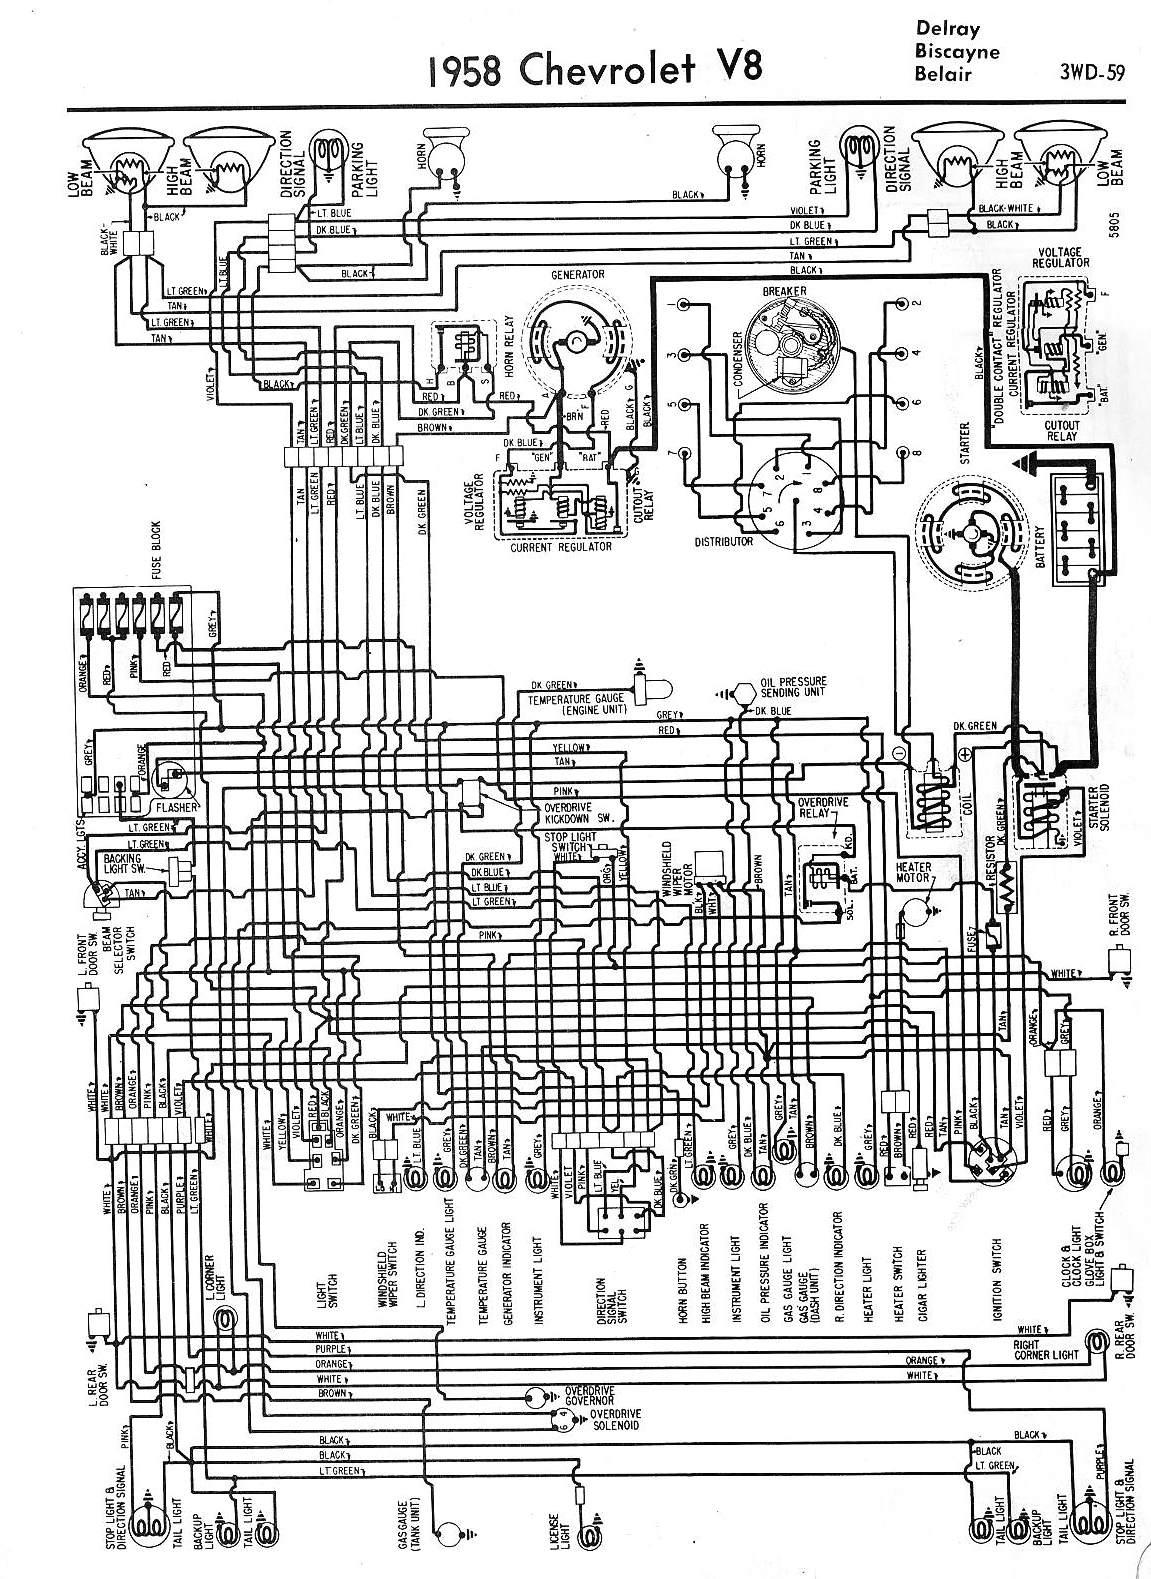 Admirable 1958 Chevrolet Wiring Diagrams 1958 Classic Chevrolet Wiring Cloud Xortanetembamohammedshrineorg